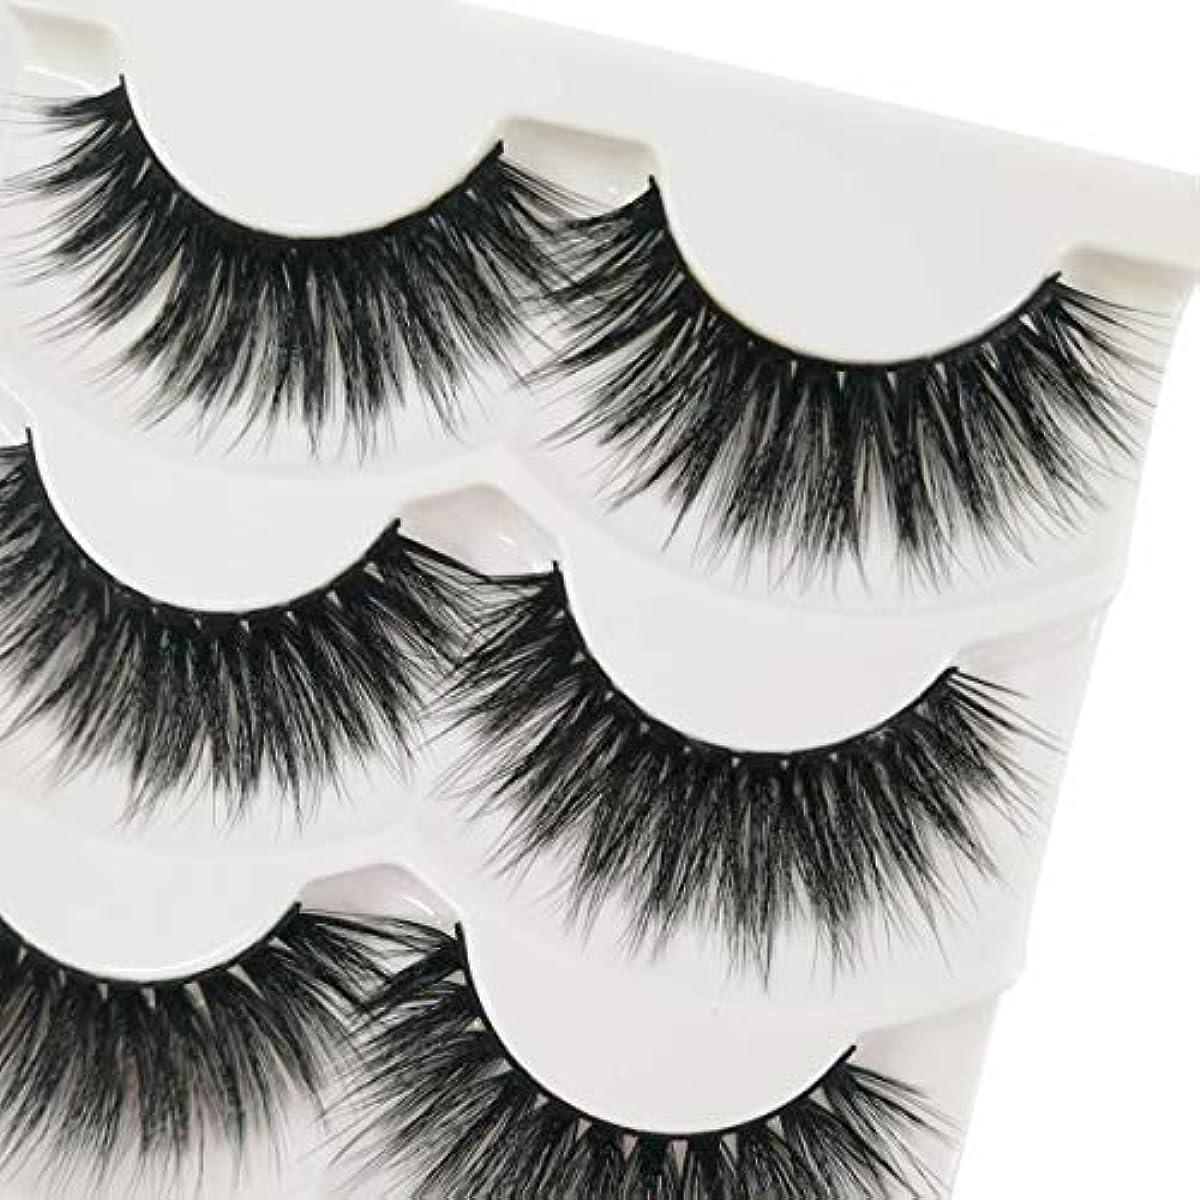 3ee72a8fd5c False Eyelashes 3D Soft Fluffy Natural Look Eye Lash Reusable 3 Pack Pairs  New